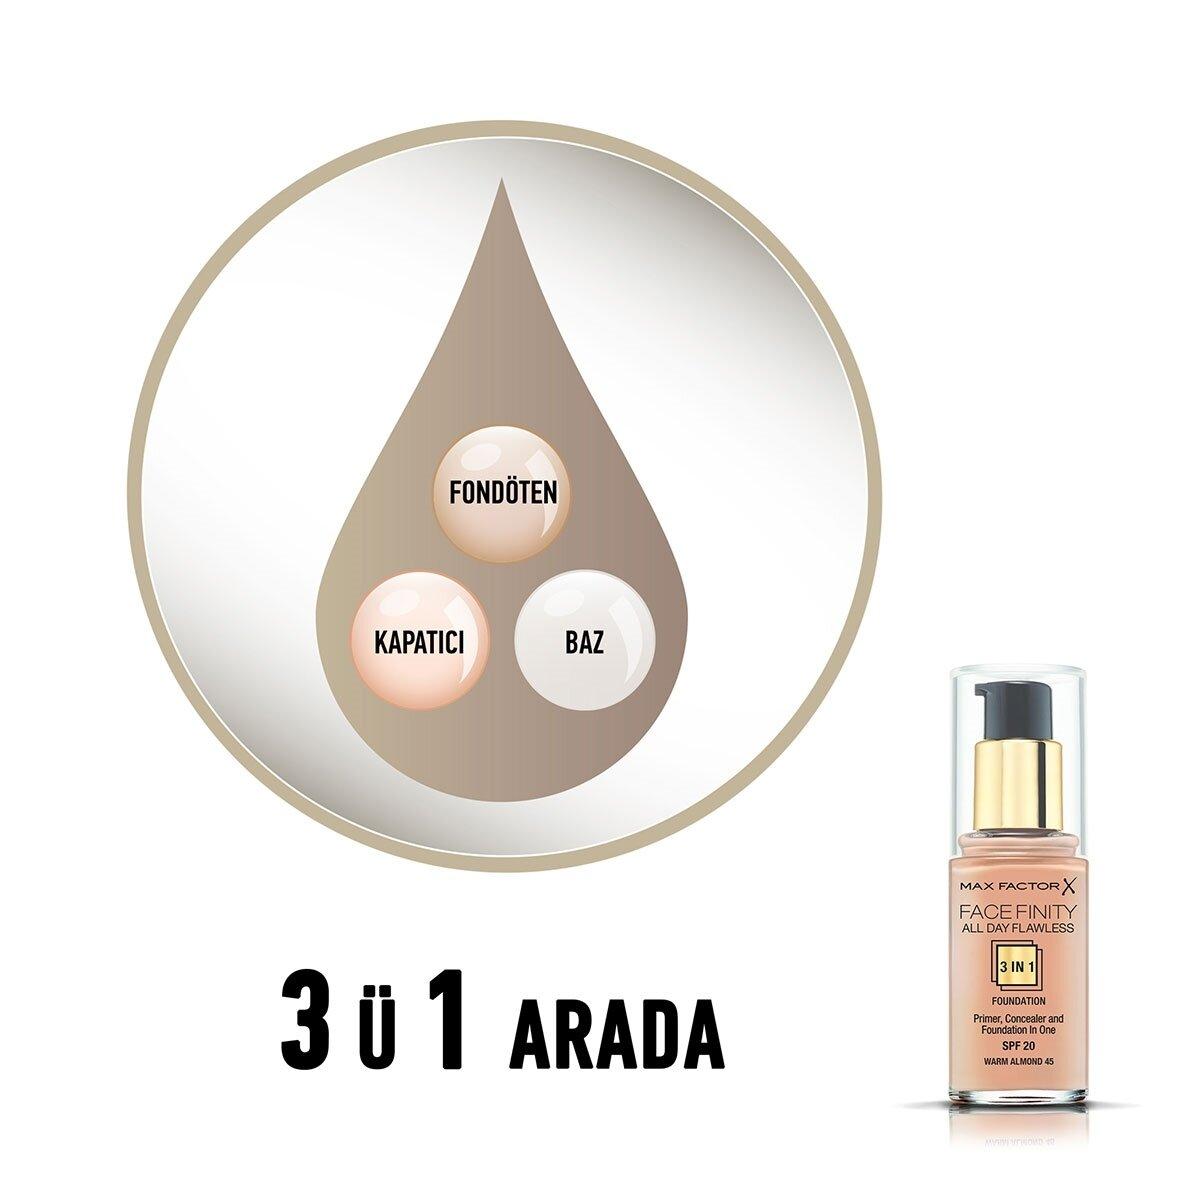 Facefinity 3'ü 1 Arada Fondöten No. 45 Warm Almond